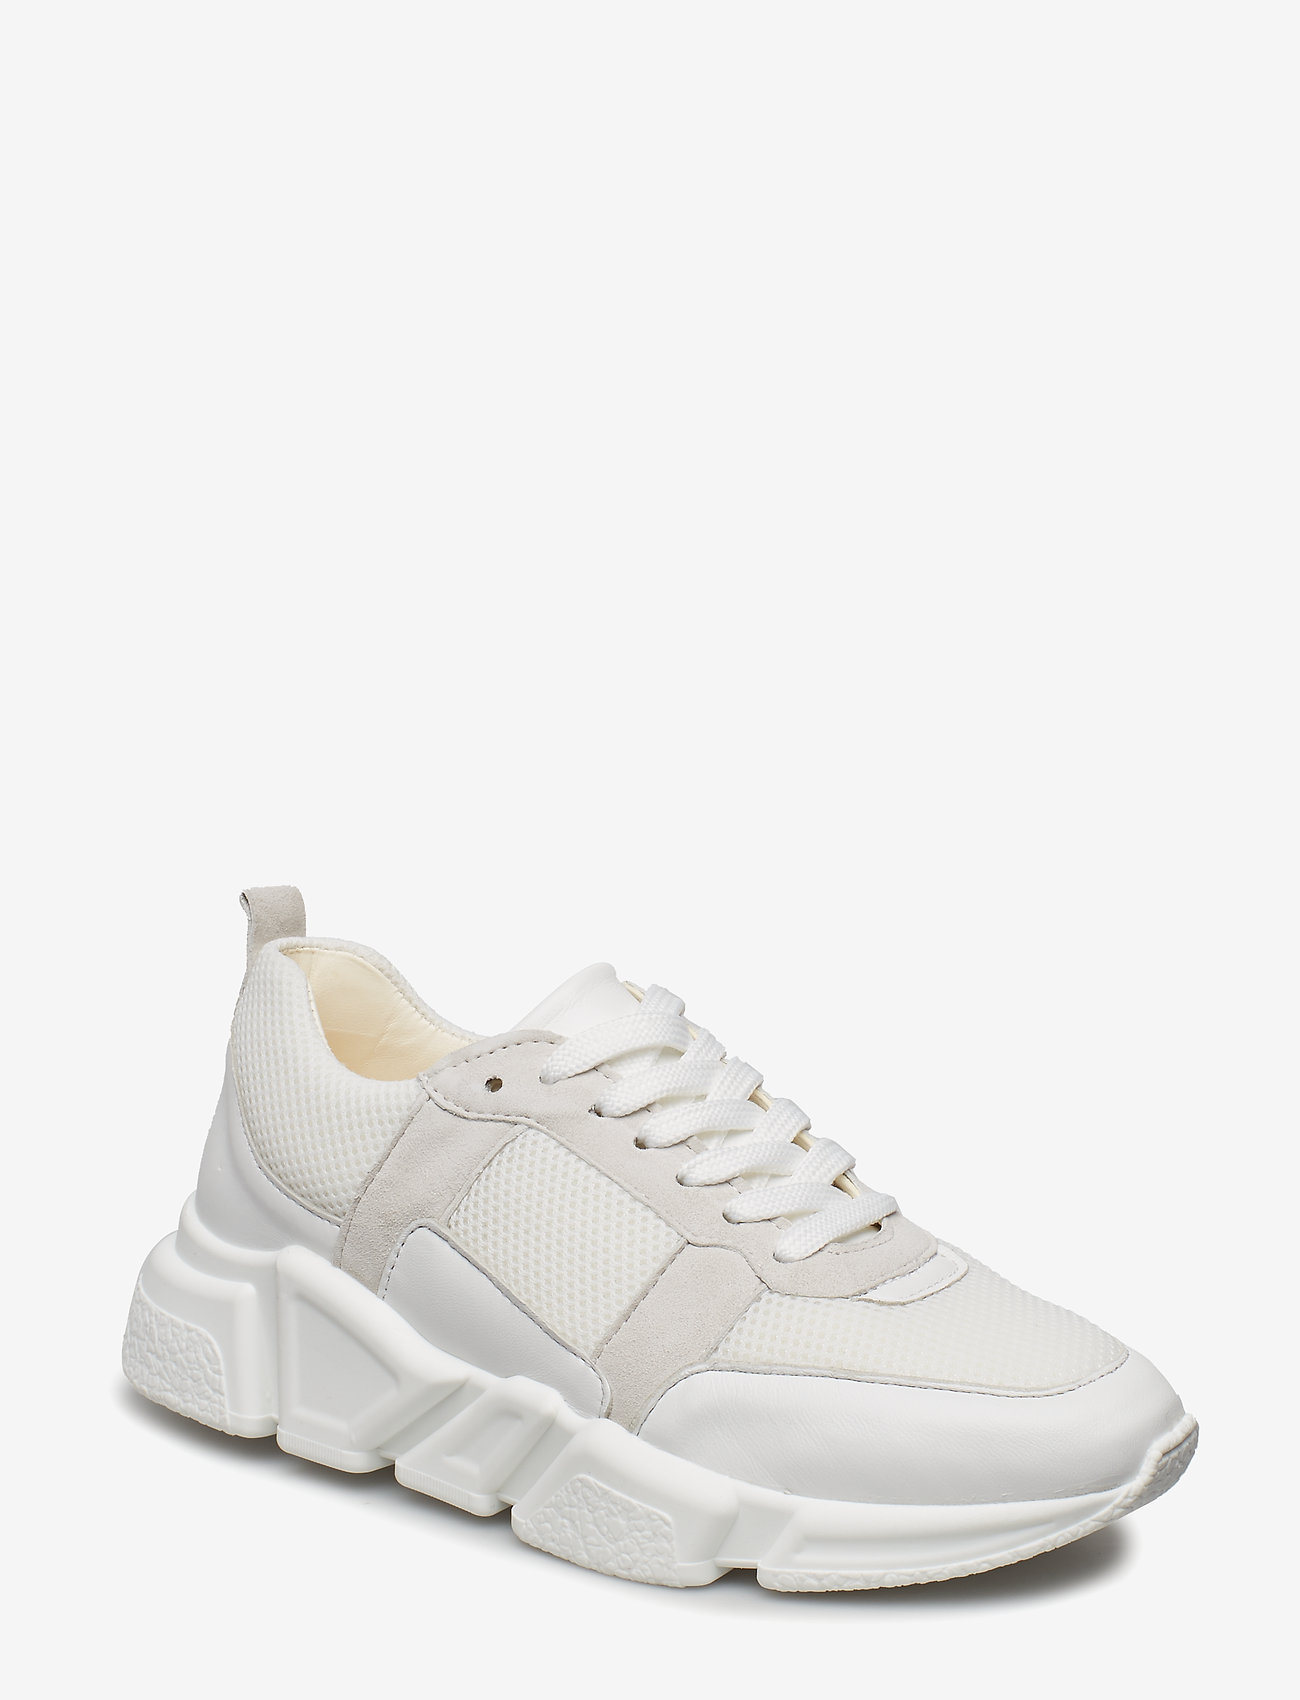 Billi Bi - SHOES 8853 - chunky sneakers - white comb. 793 - 0